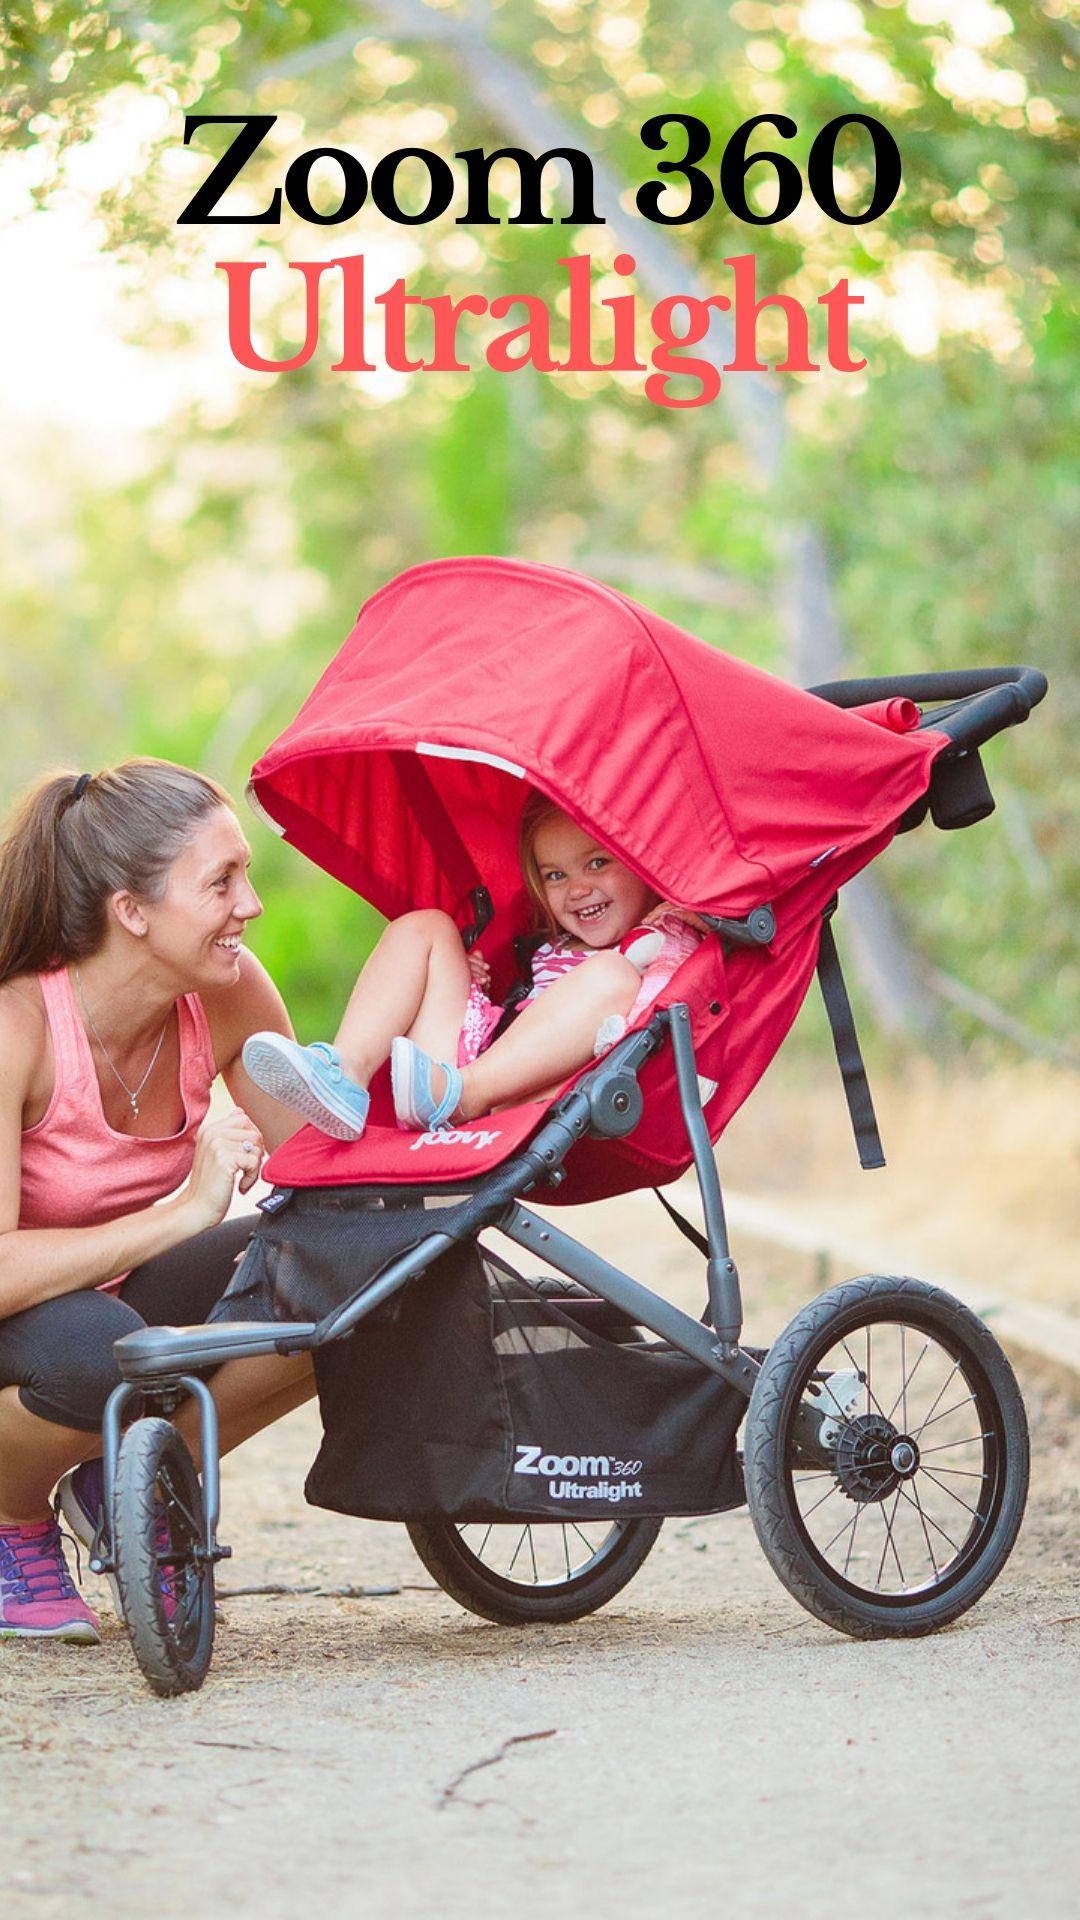 Zoom 360 Ultralight Jogging stroller, Strollers at